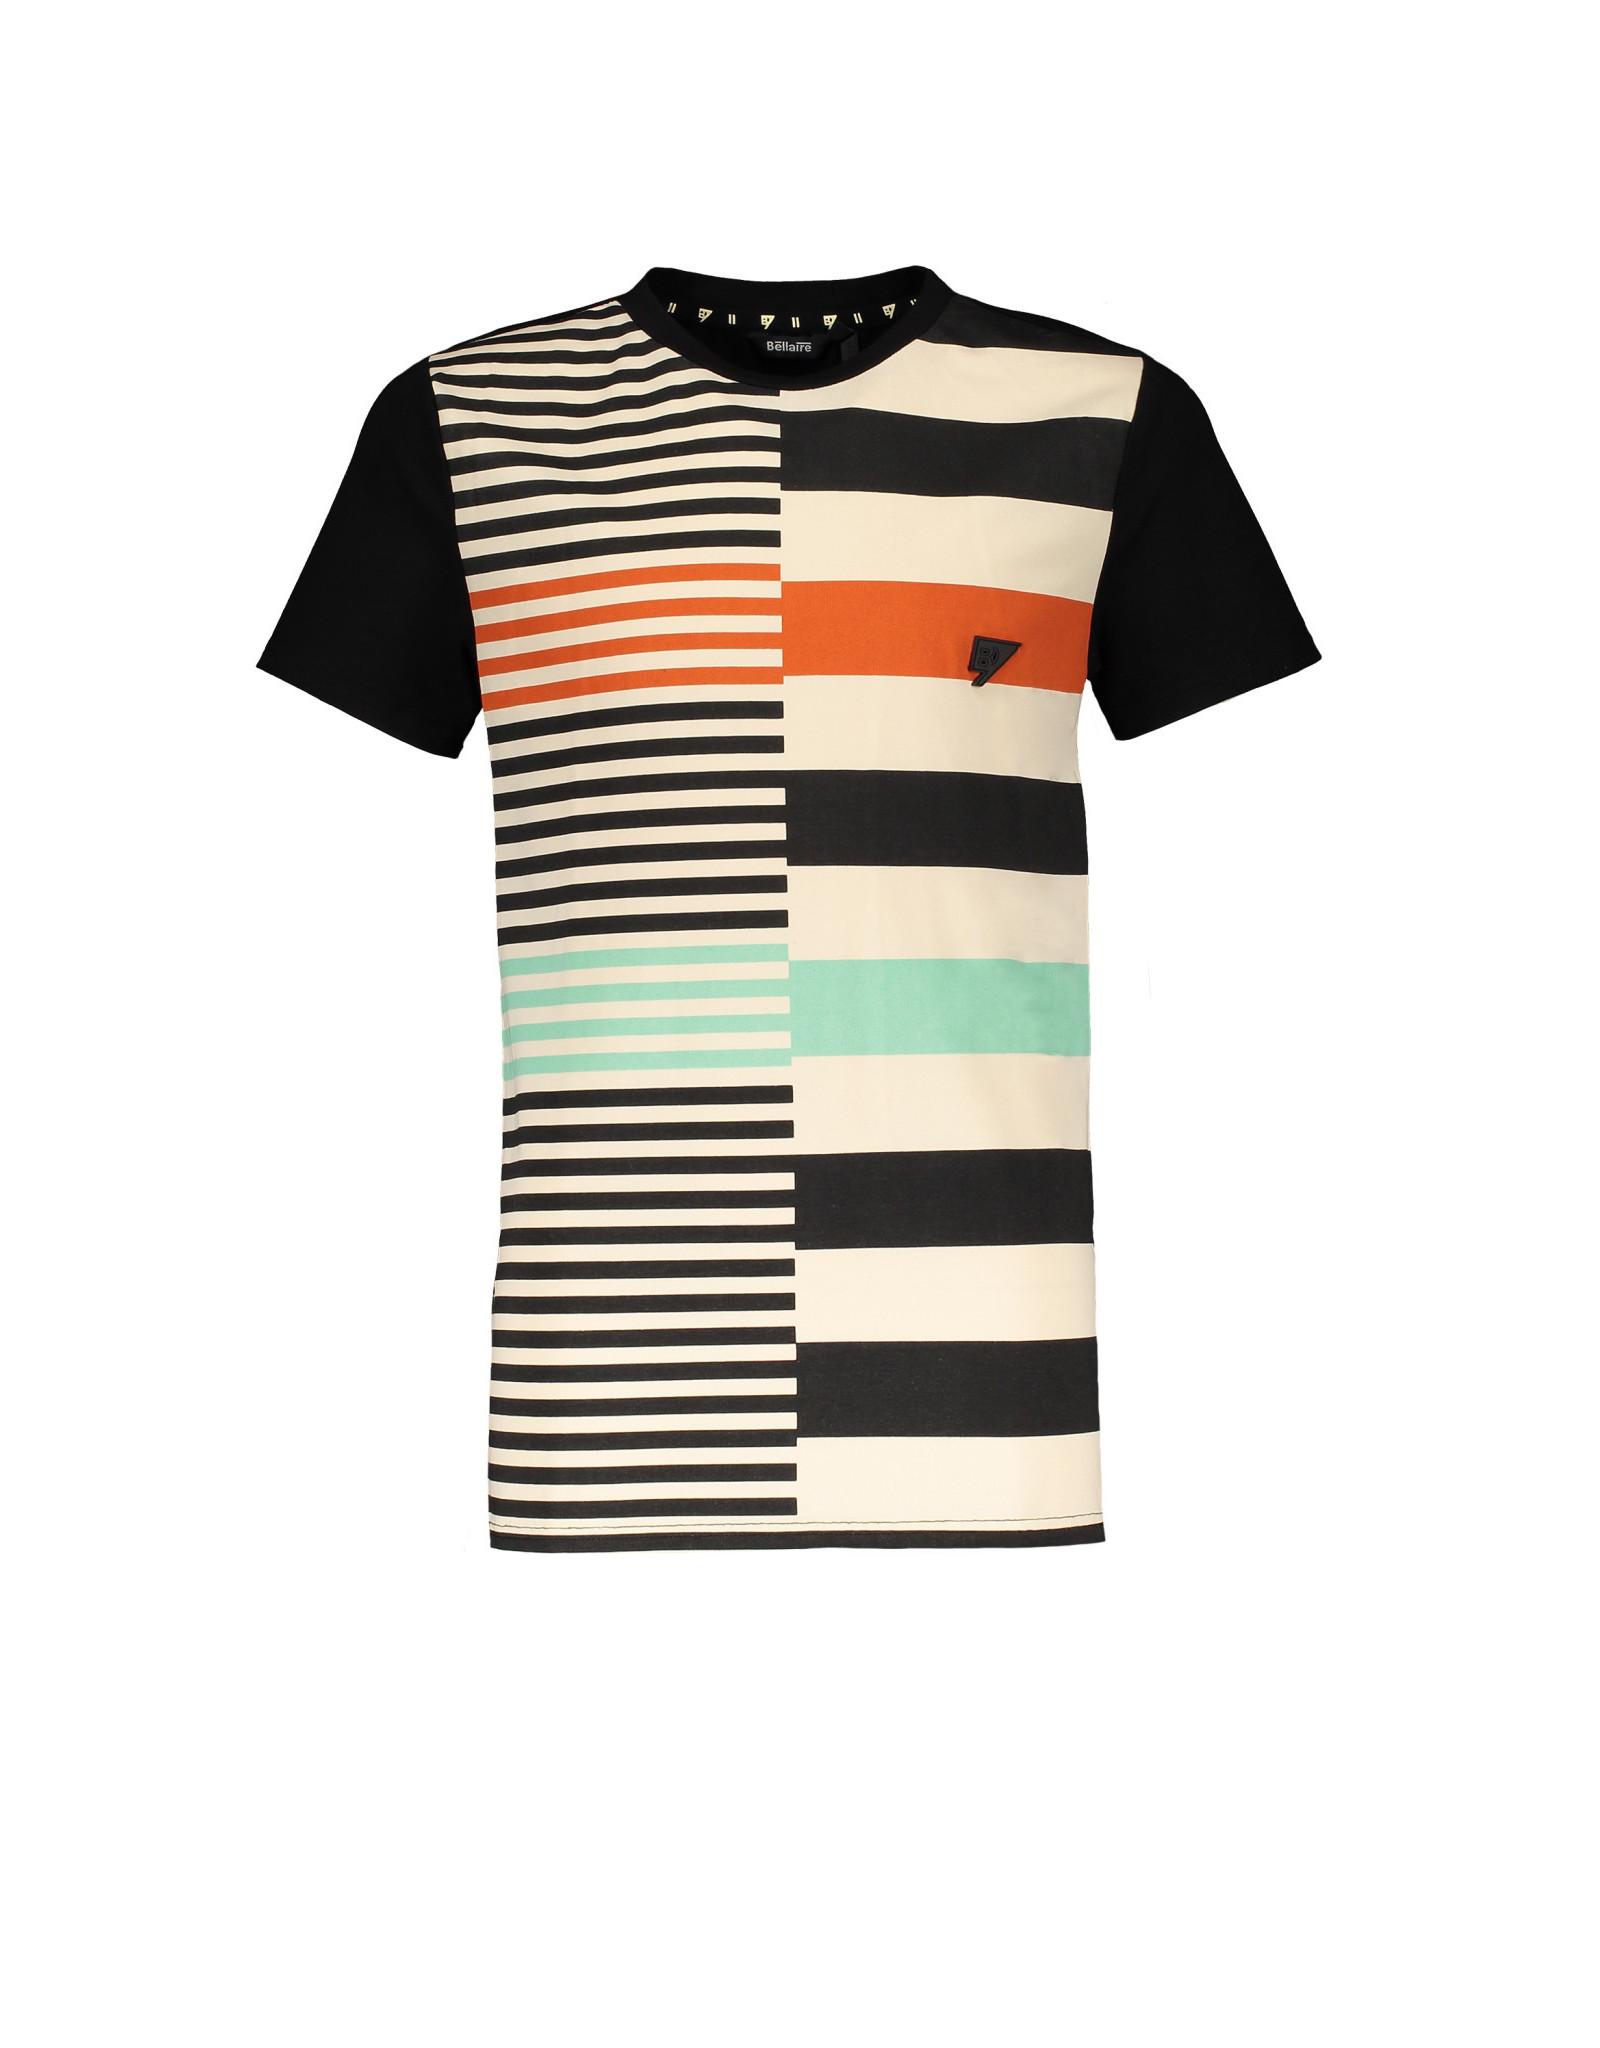 Bellaire Bellaire jongens t-shirt Kore Caviar